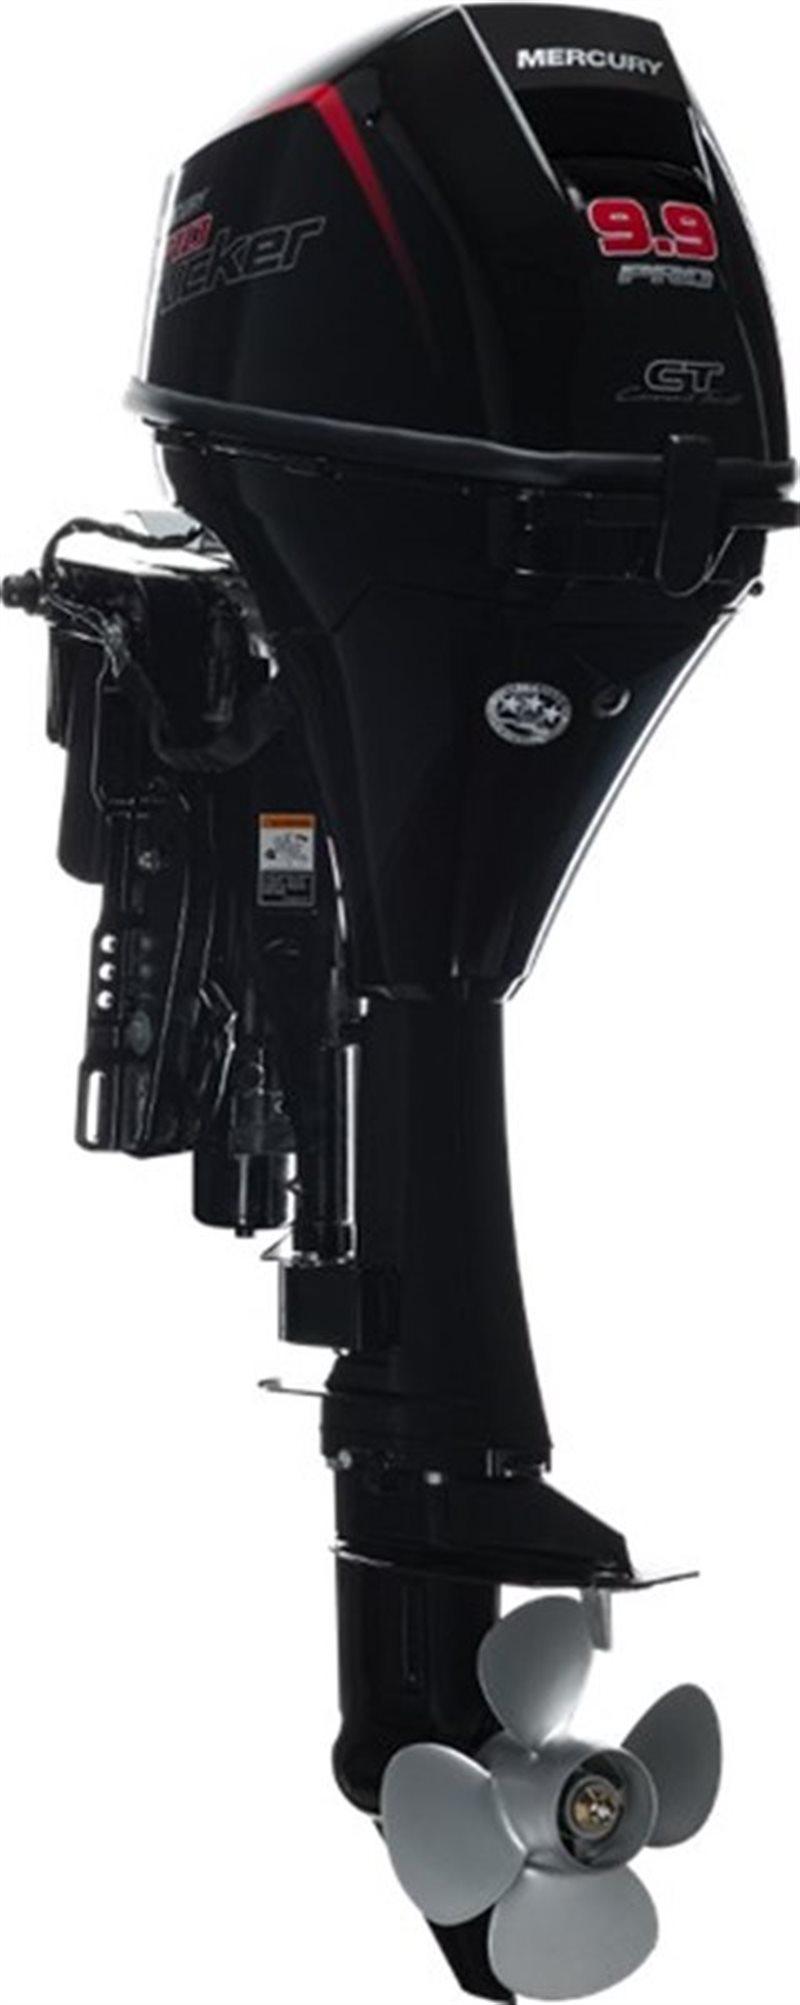 2021 Mercury Outboard FourStroke 8-9.9 hp 99 hp EFI ProKicker at Pharo Marine, Waunakee, WI 53597